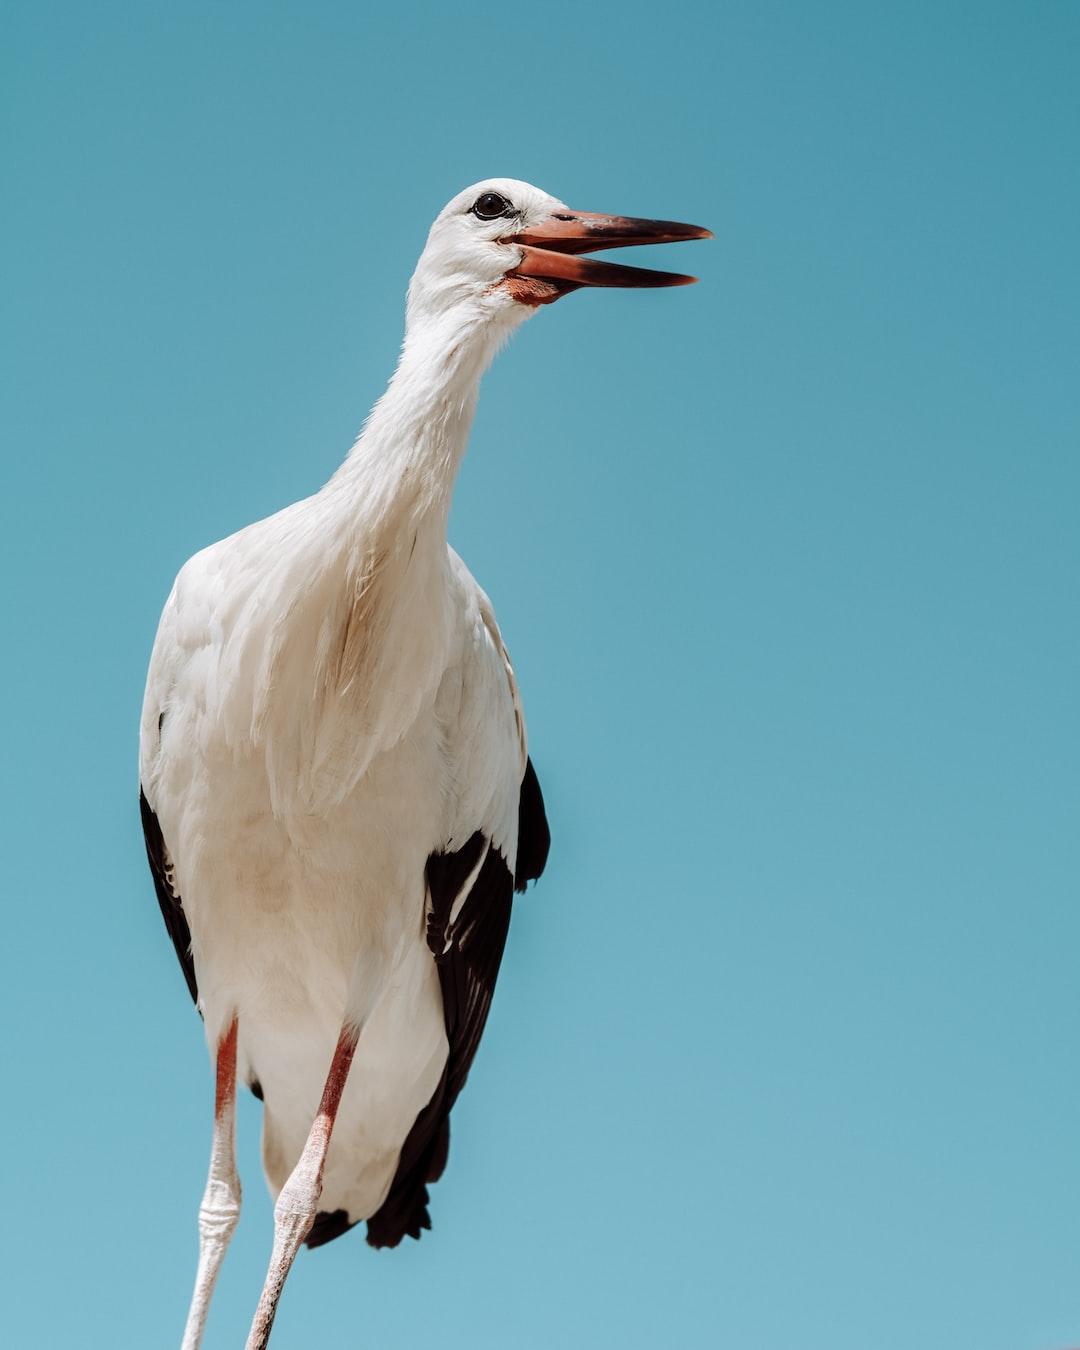 Human-Friendly White Stork